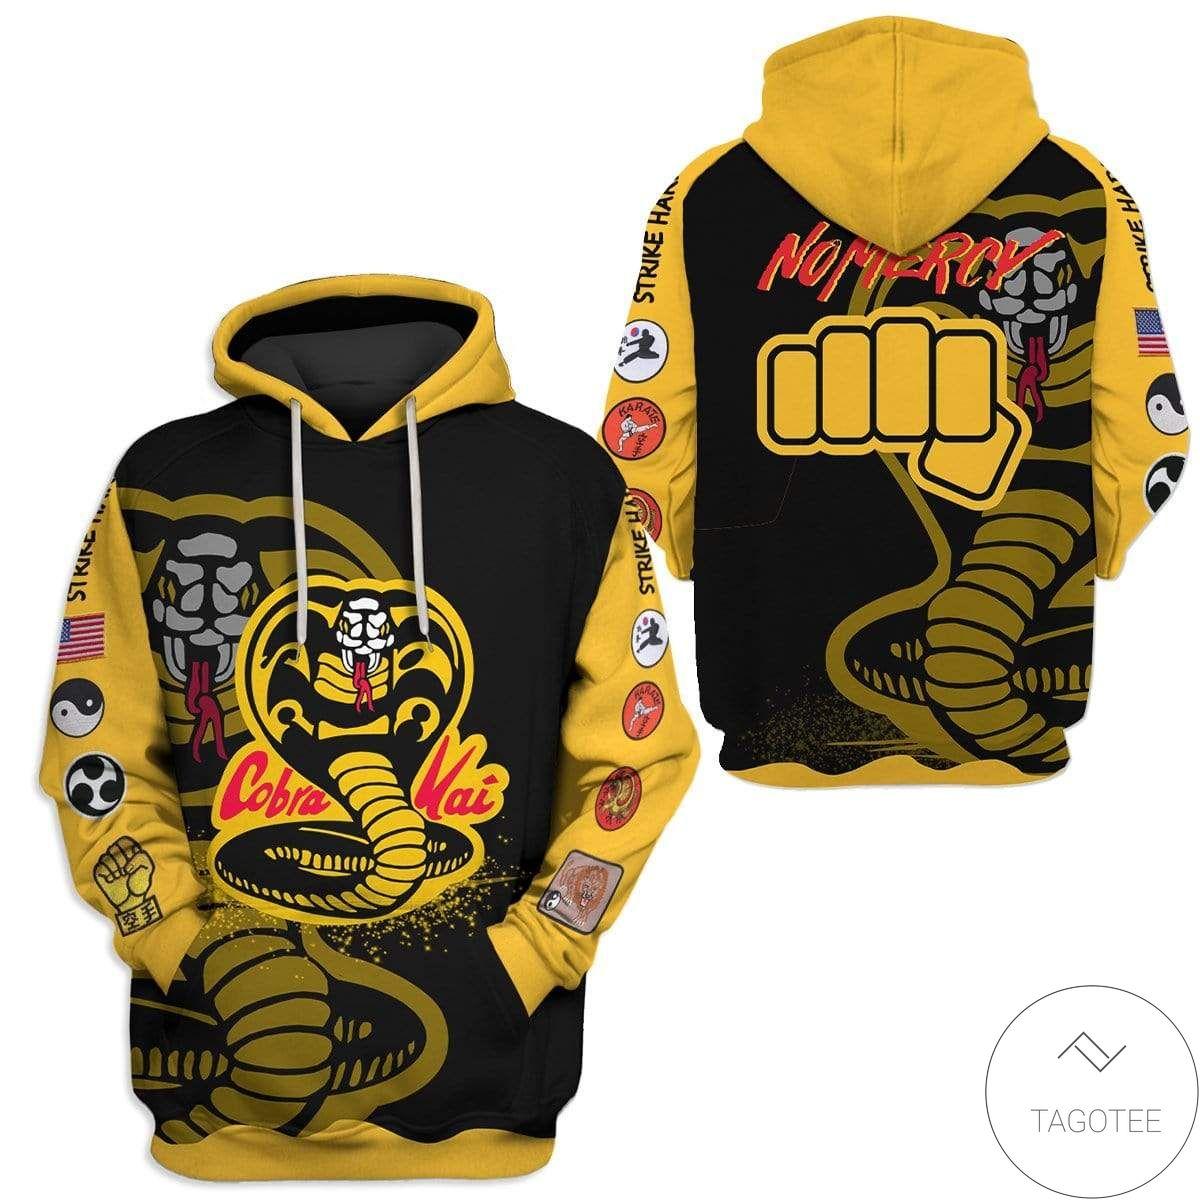 US Shop Personalized Cobra Kai No Mercy Hoodie